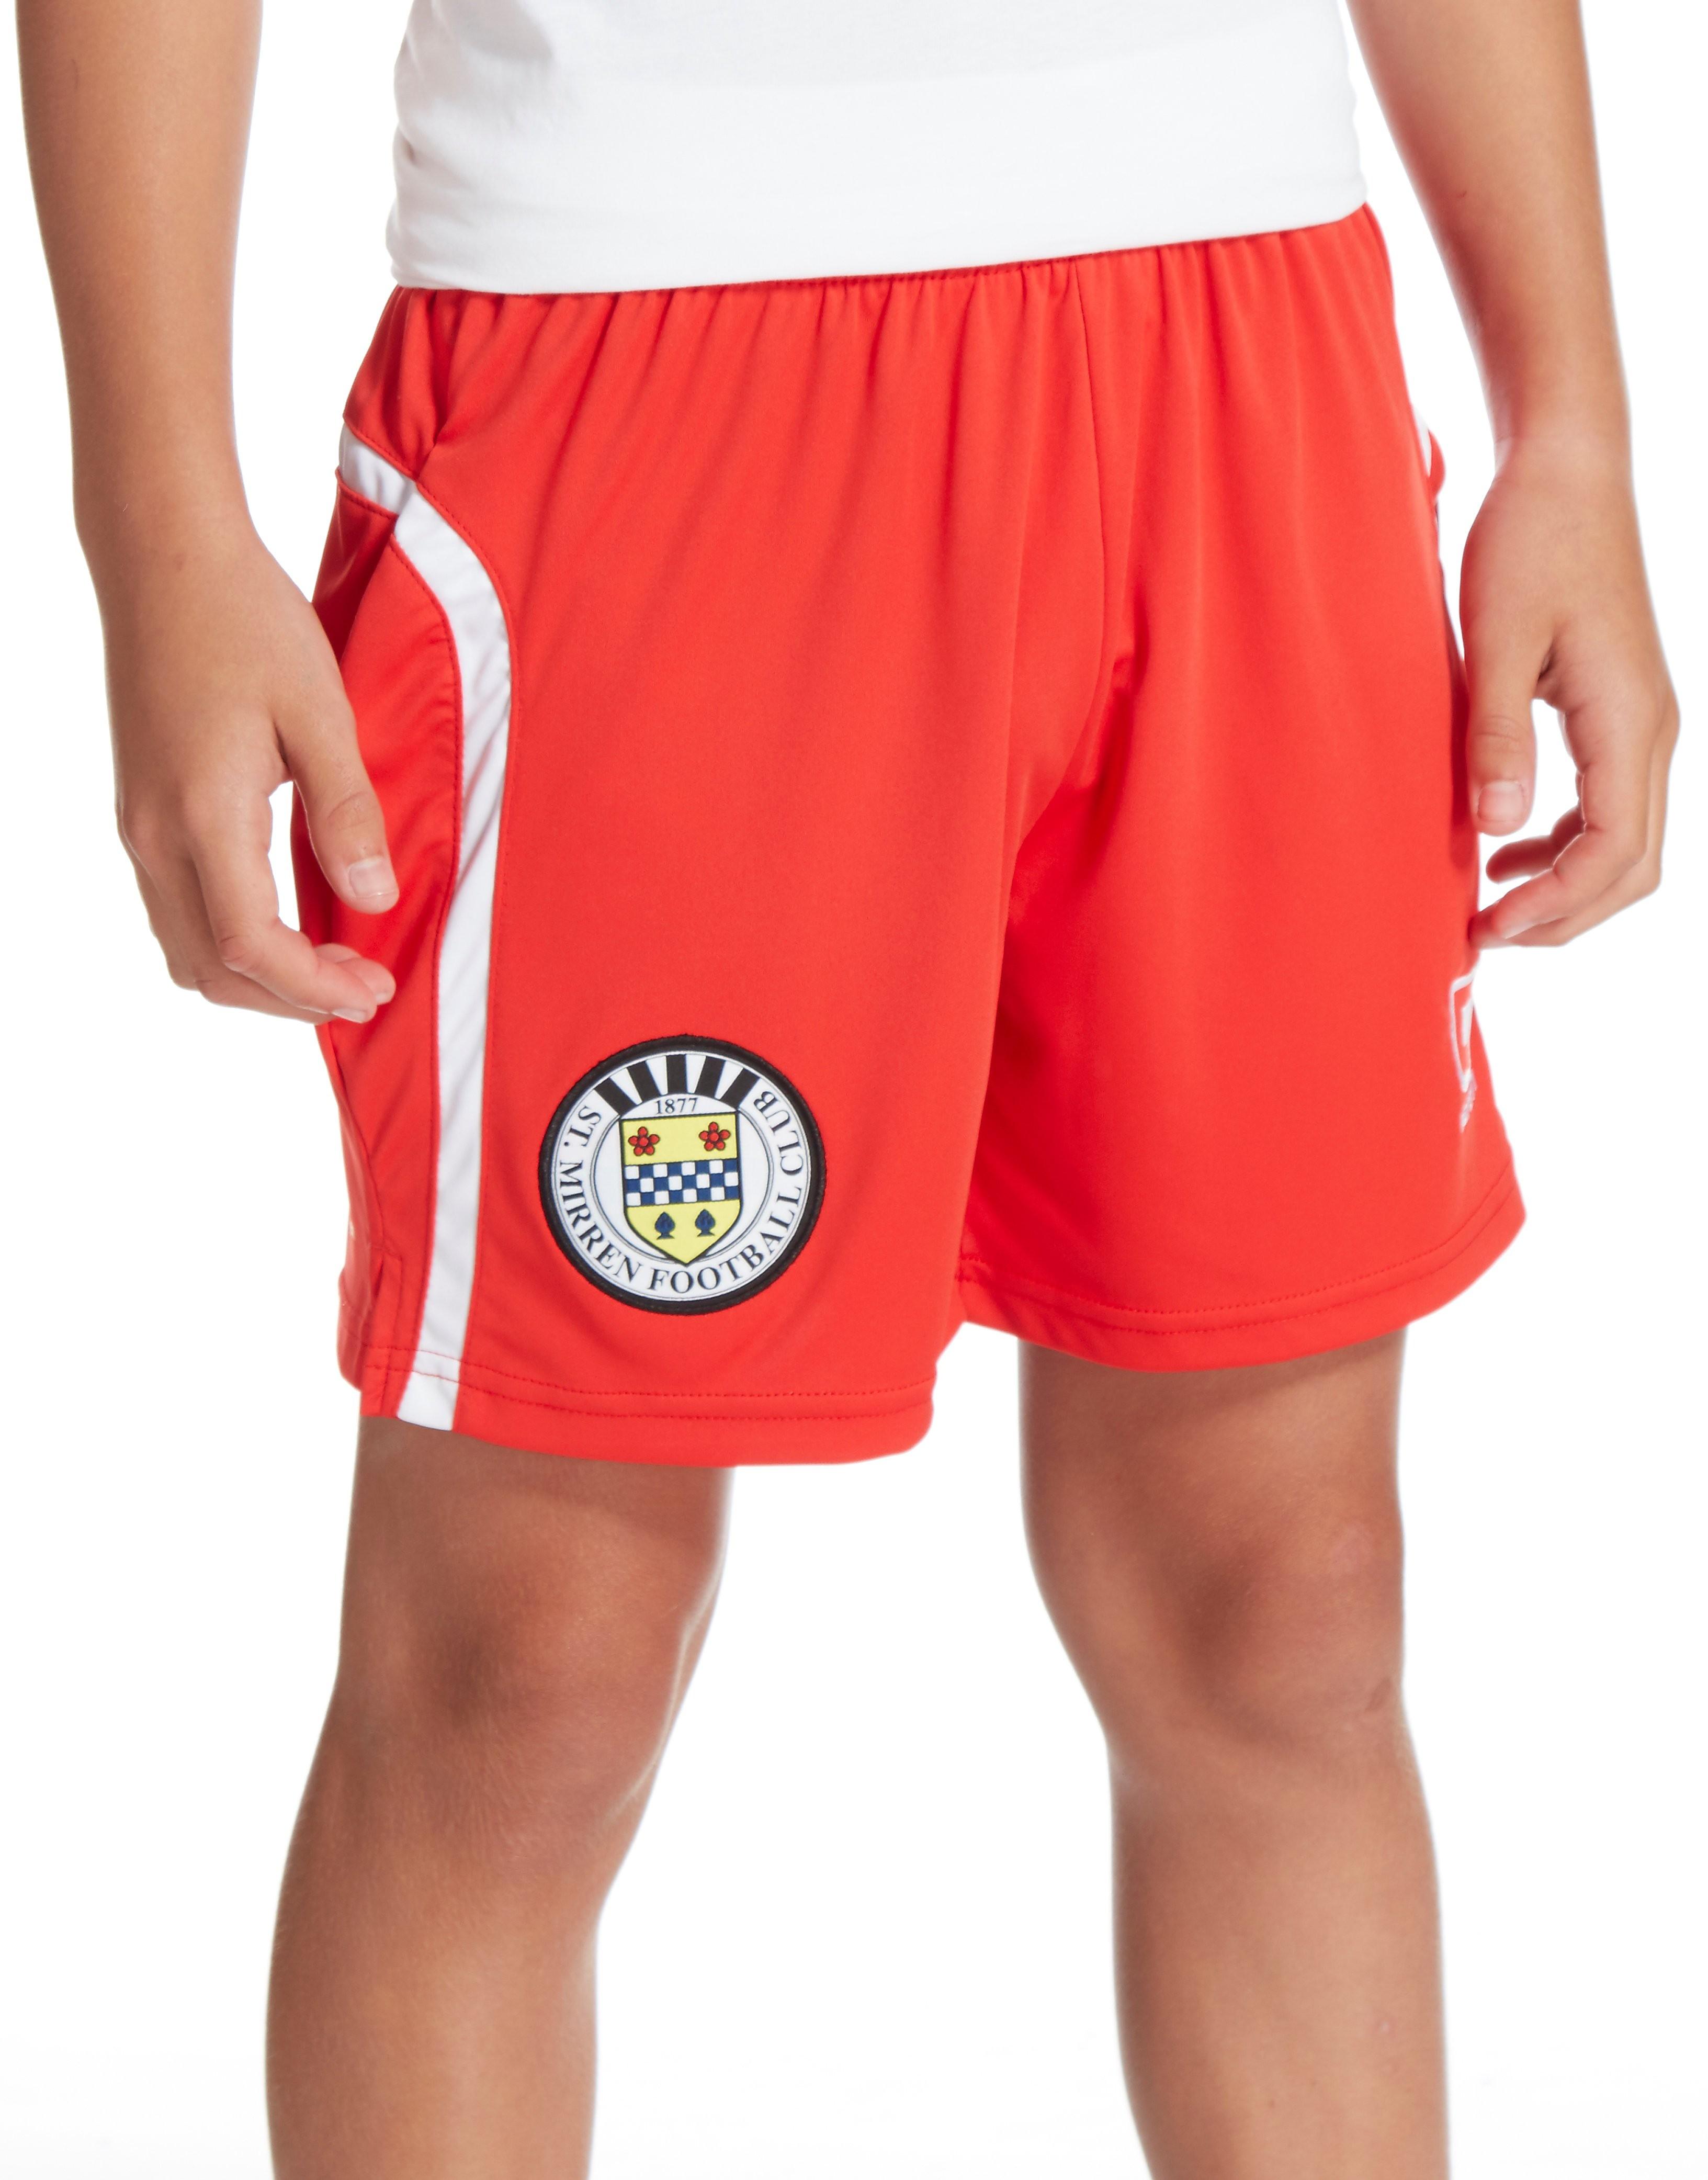 Carbrini St Mirren FC 2016/17 Home Shorts Jnr PRE ORDER